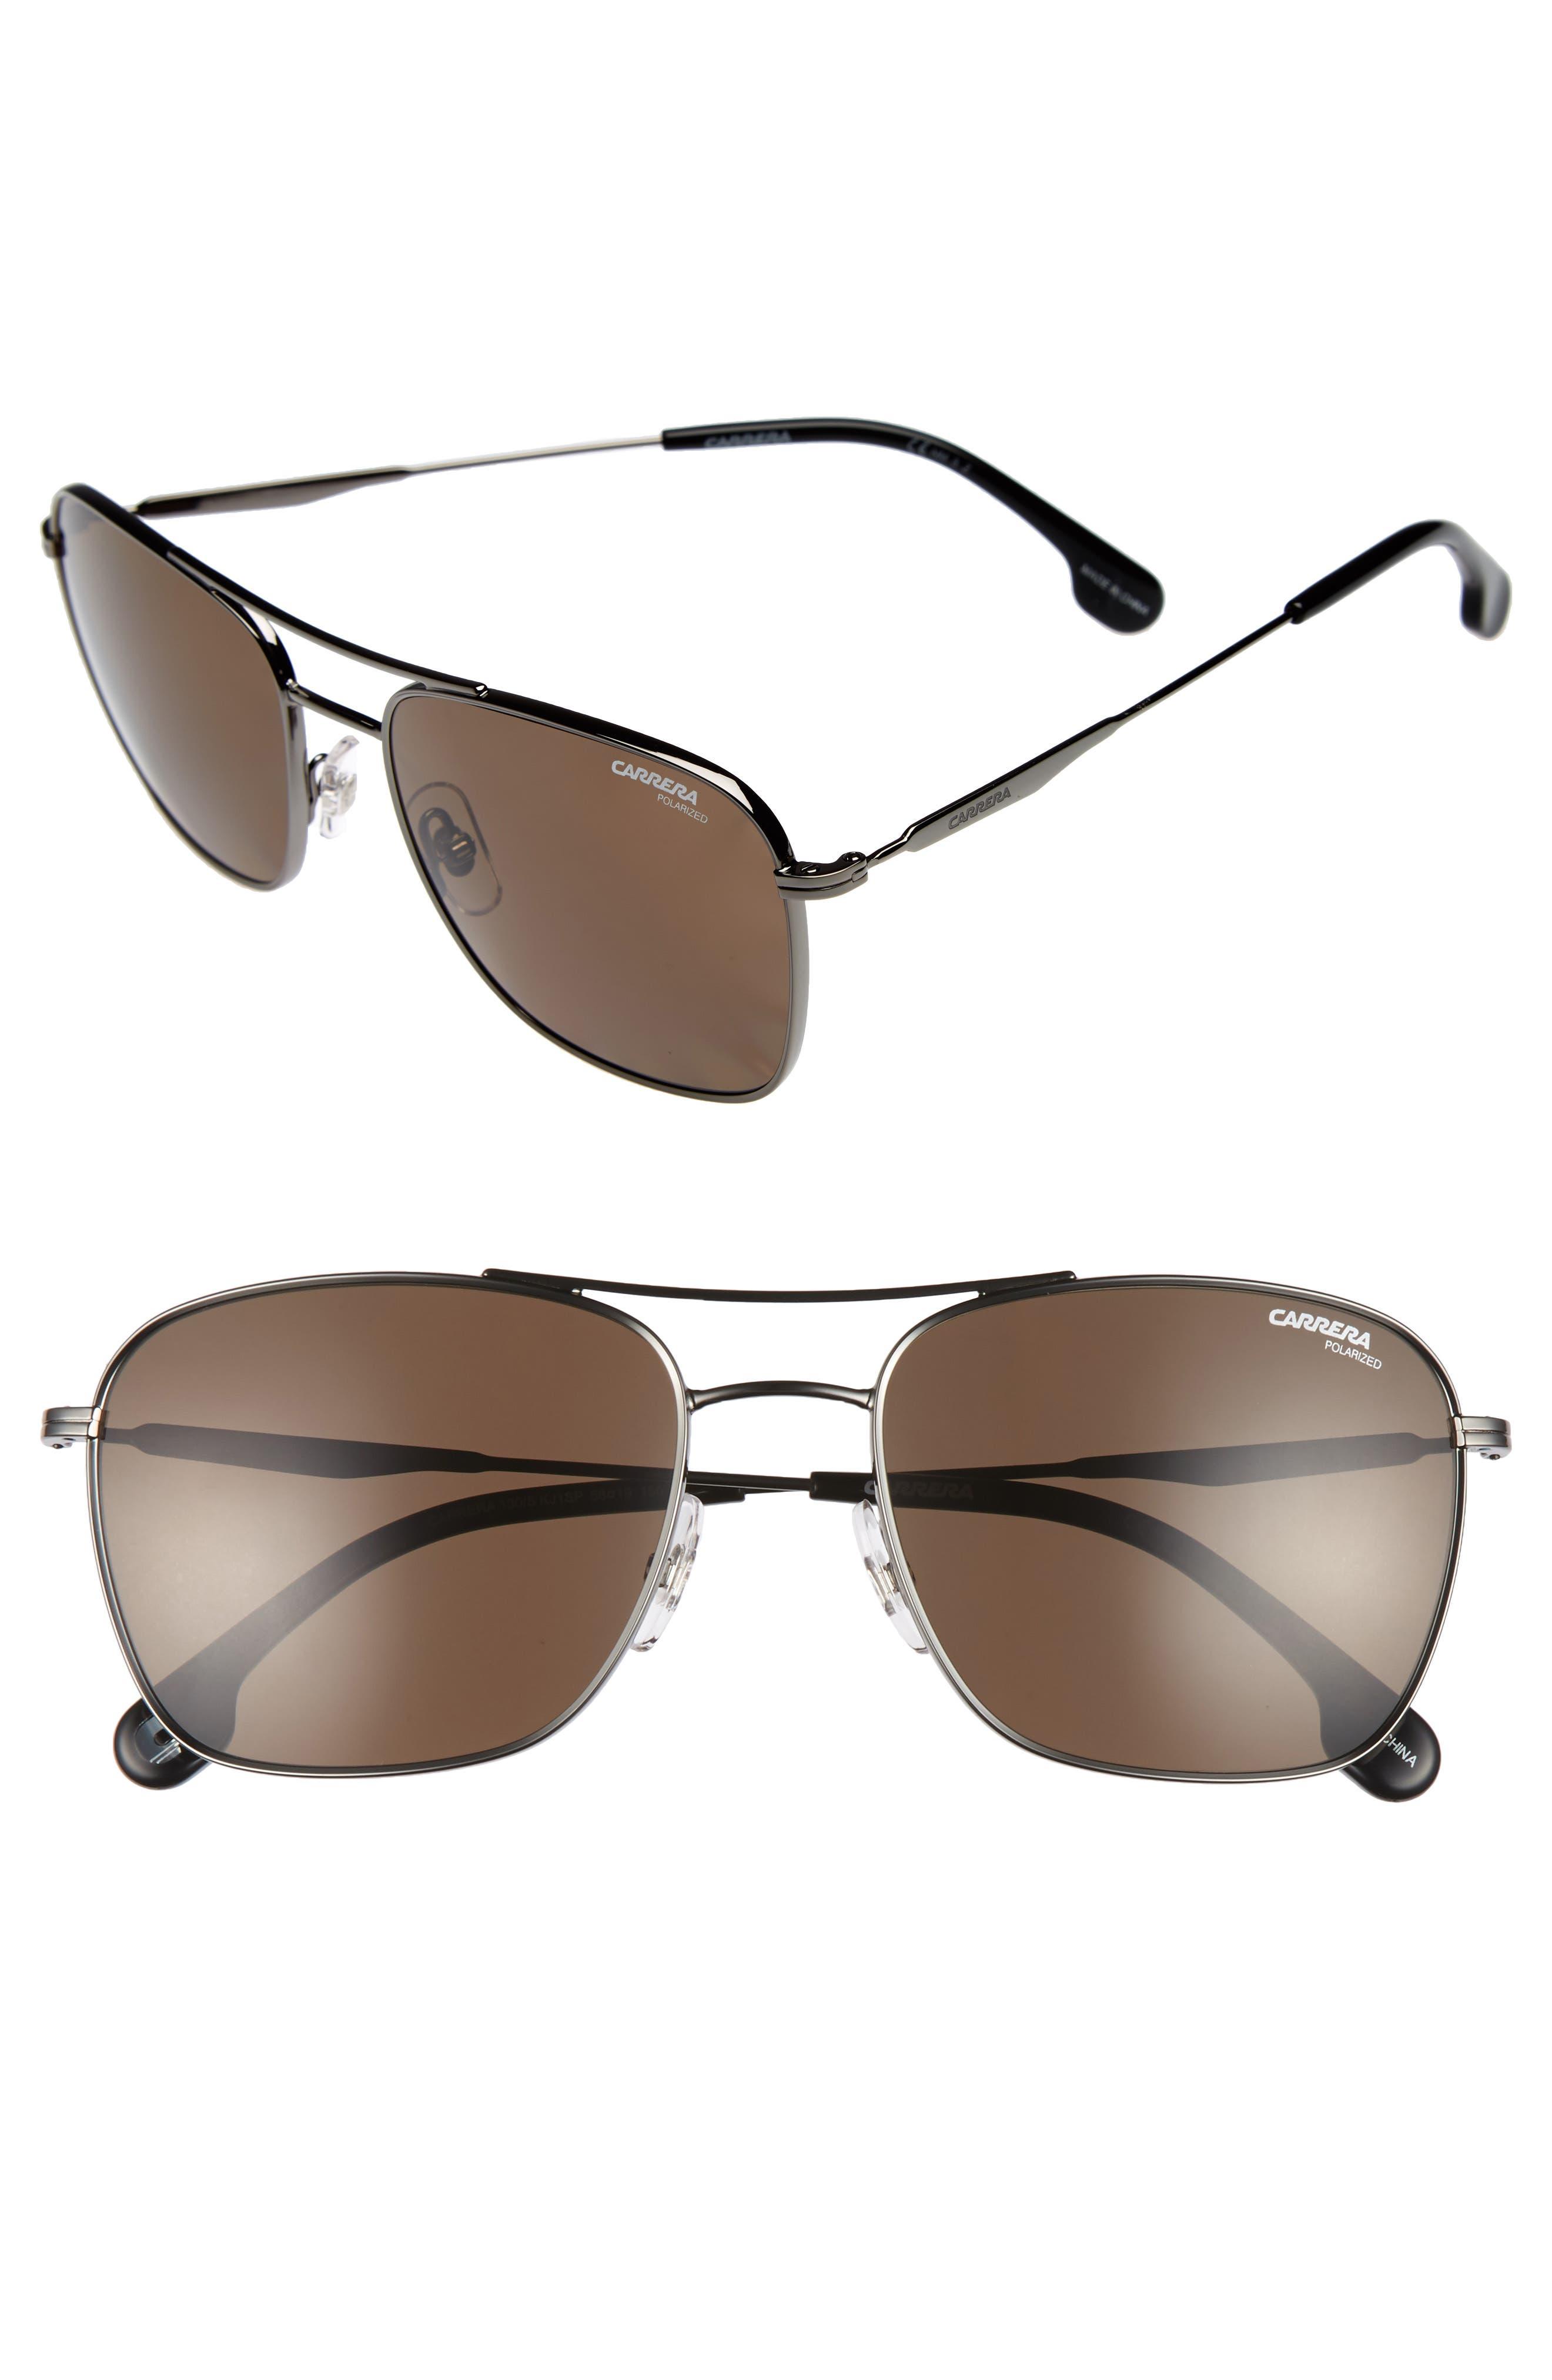 Carrera Eyewear 5 Polarized Sunglasses - Dark Ruthenium